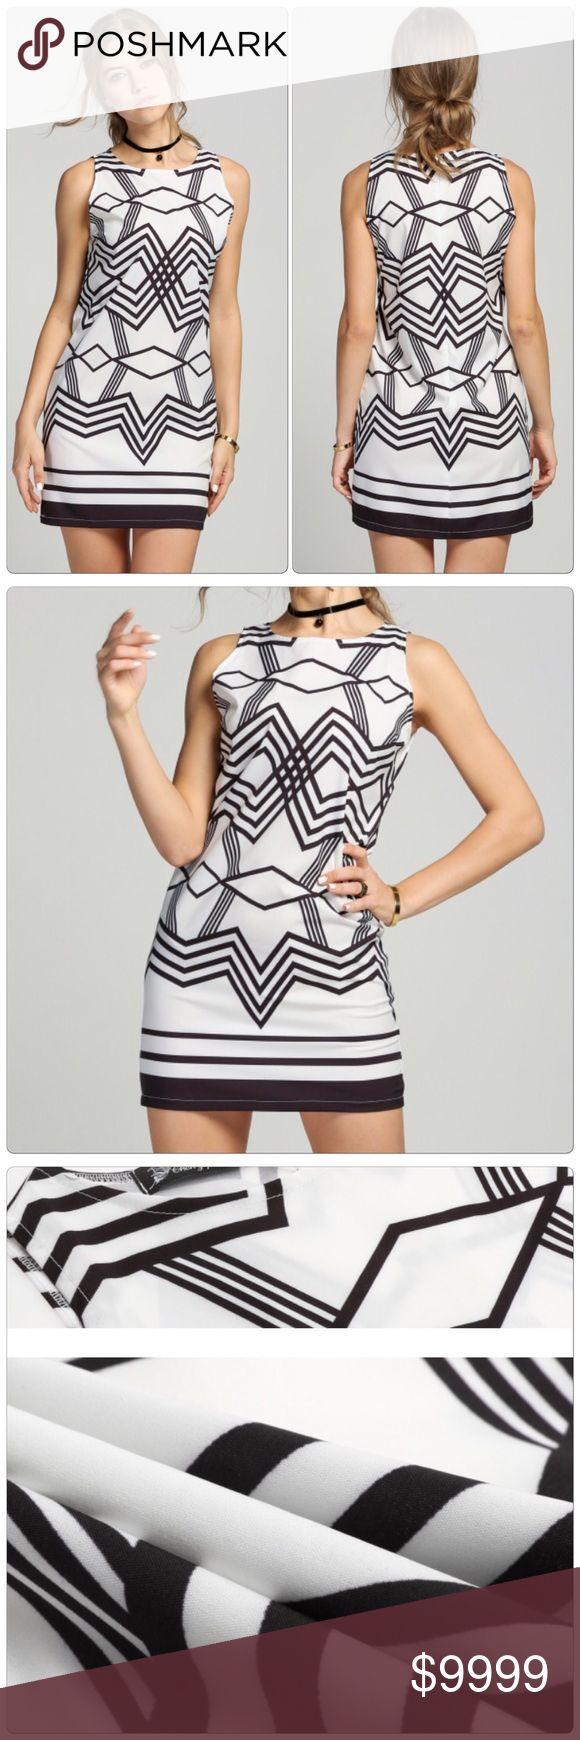 Geometric Pattern Short Dress Very Cool Geometric Pattern A-Line Short Dress, Material: Polyester Collar: Round Neck Dress Length: Above Knee Pattern: Geometric Pattern Closure Type: Zipper Back.                                                                                              ✅Price is firm unless bundle                                                                                                                             ❌NO TRADES. ❌NO LOWBALL OFFERS Dresses Mini